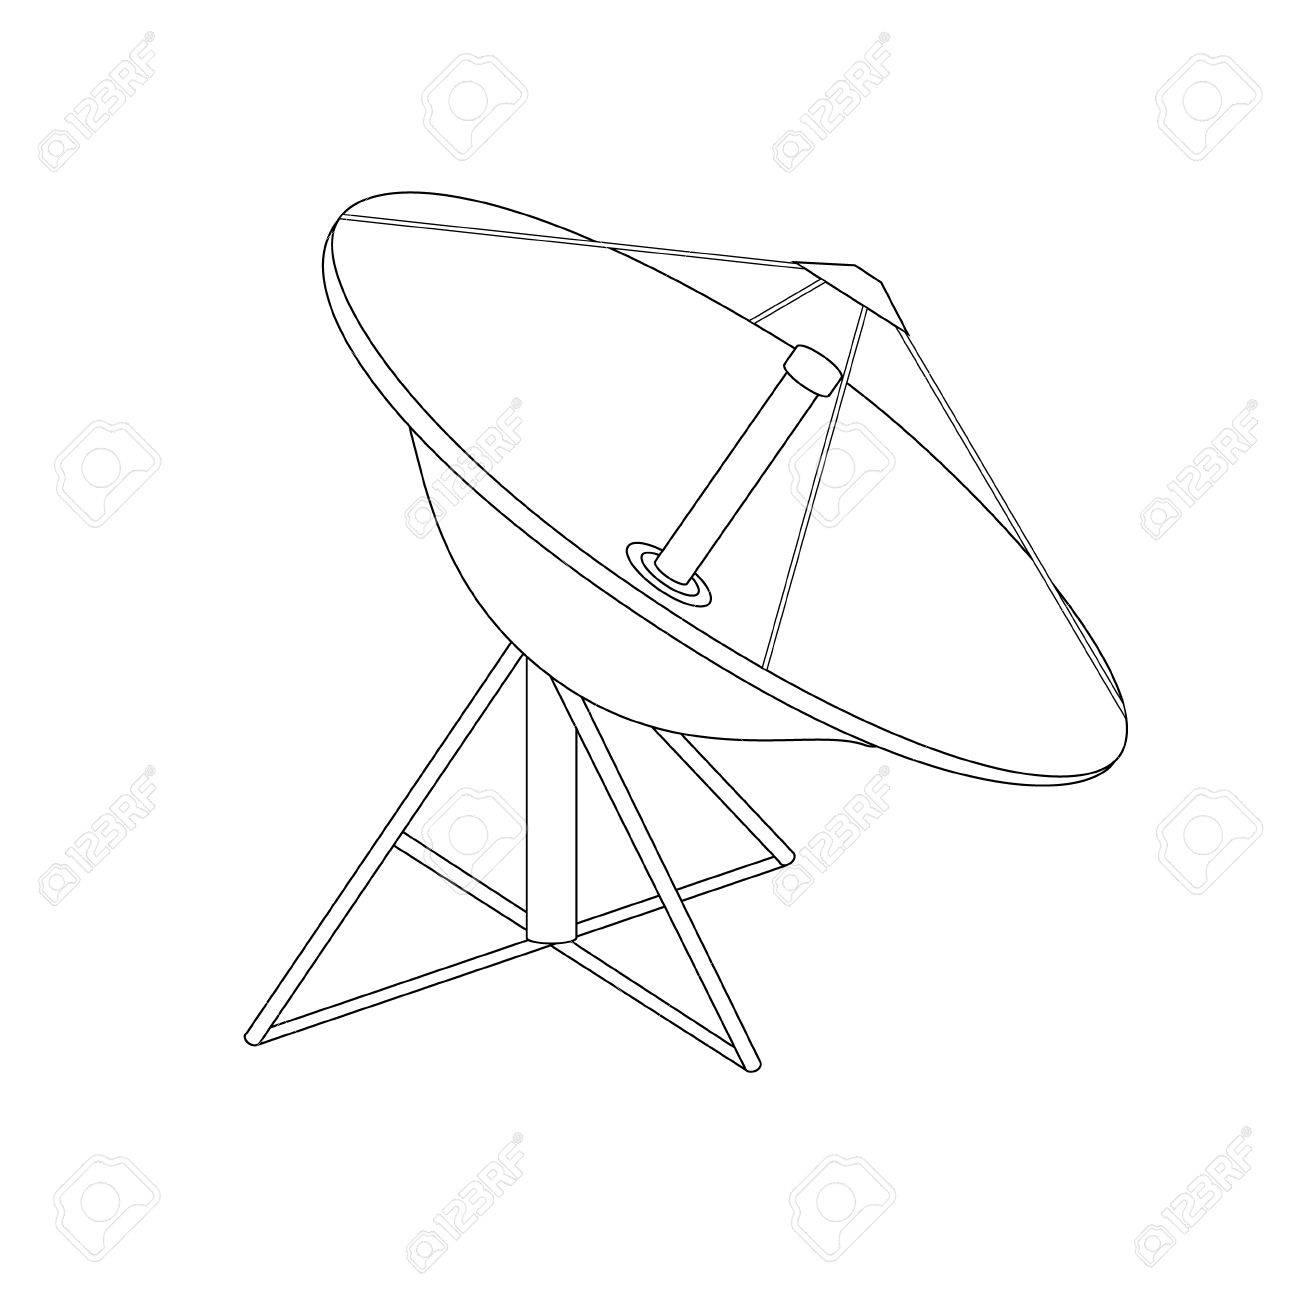 1300x1300 Raster Illustration Satellite Dish Antenna Outline Drawing. Radar